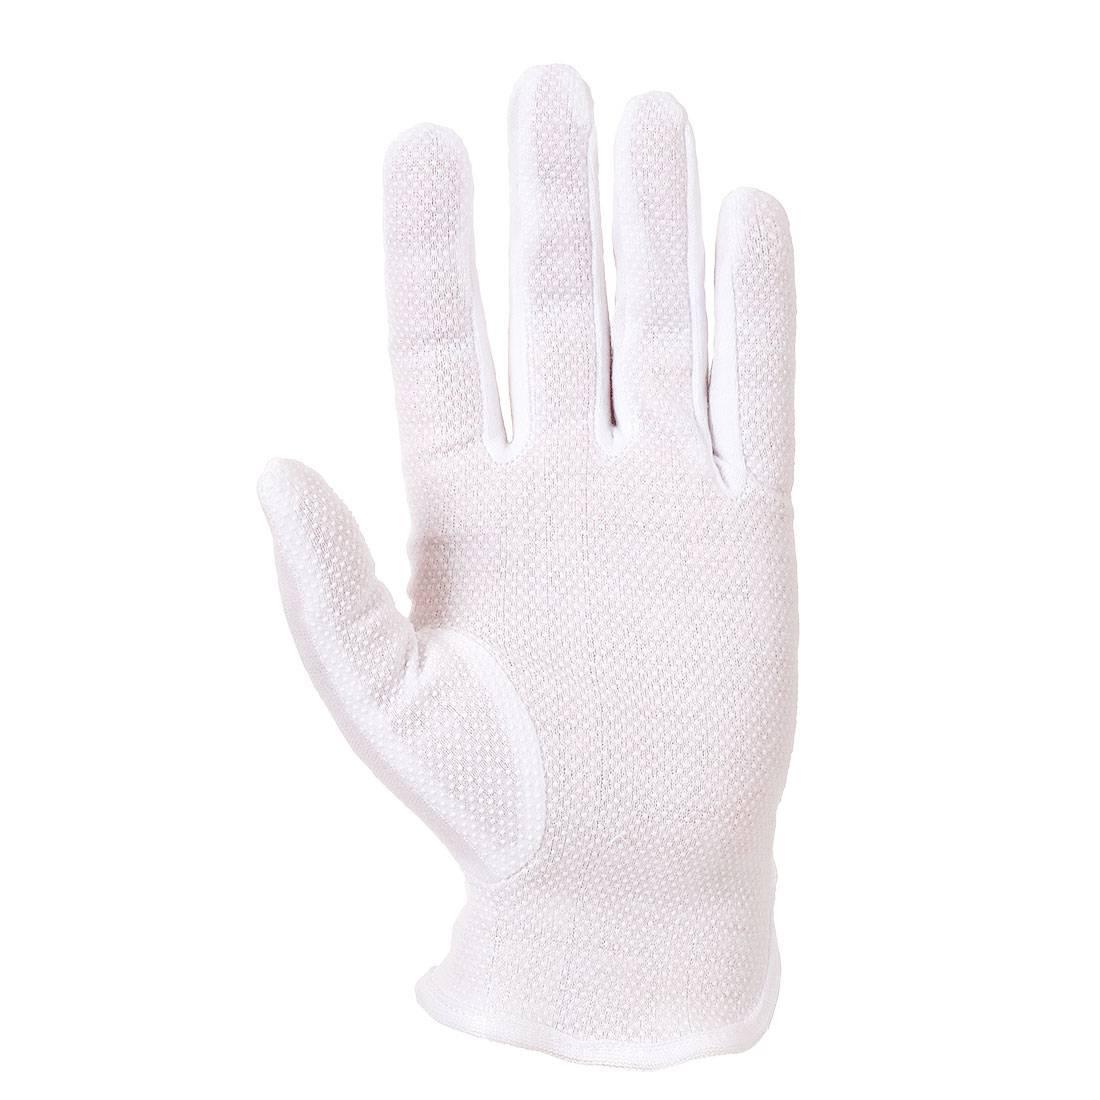 Portwest Handschoenen A080 wit(WH)